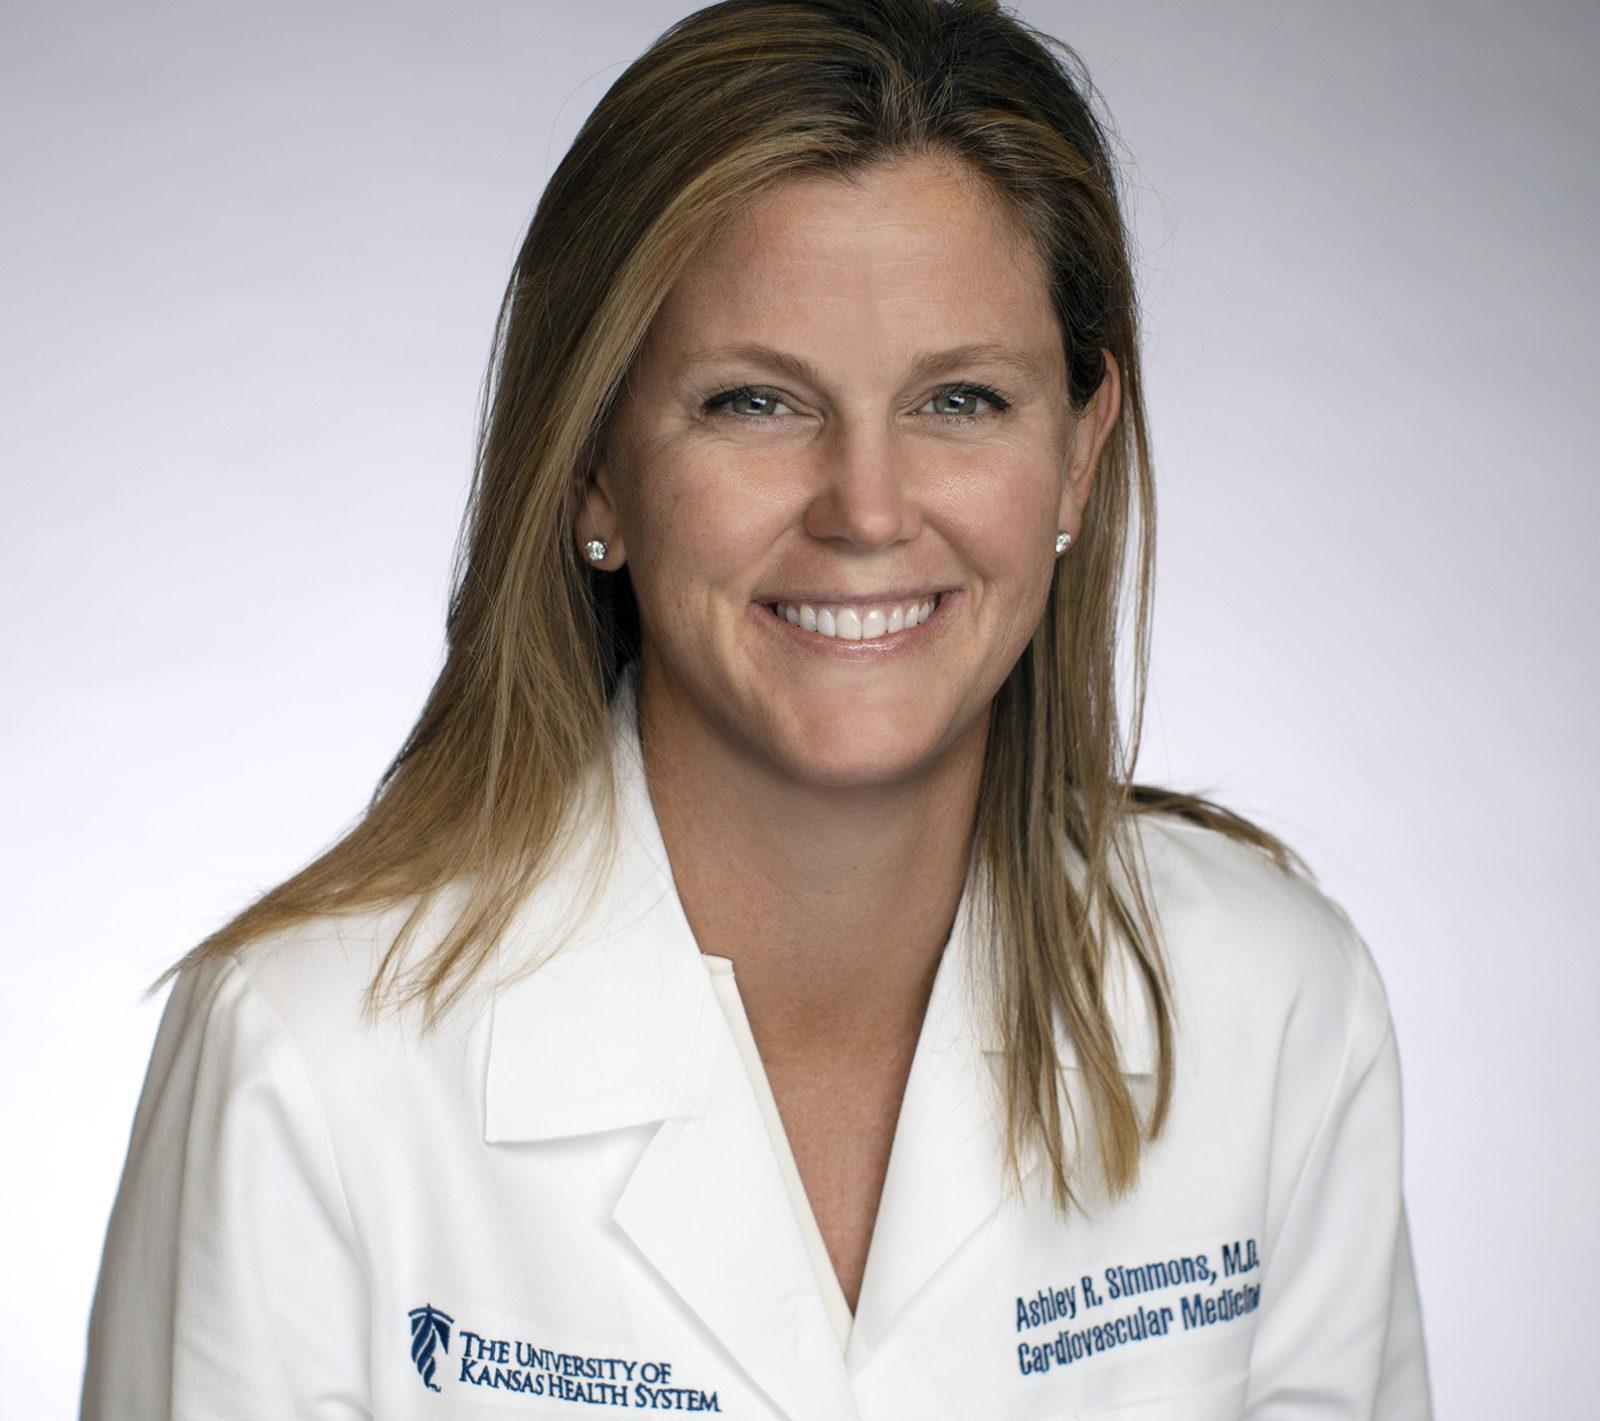 Ashley Simmons, MD, FACC